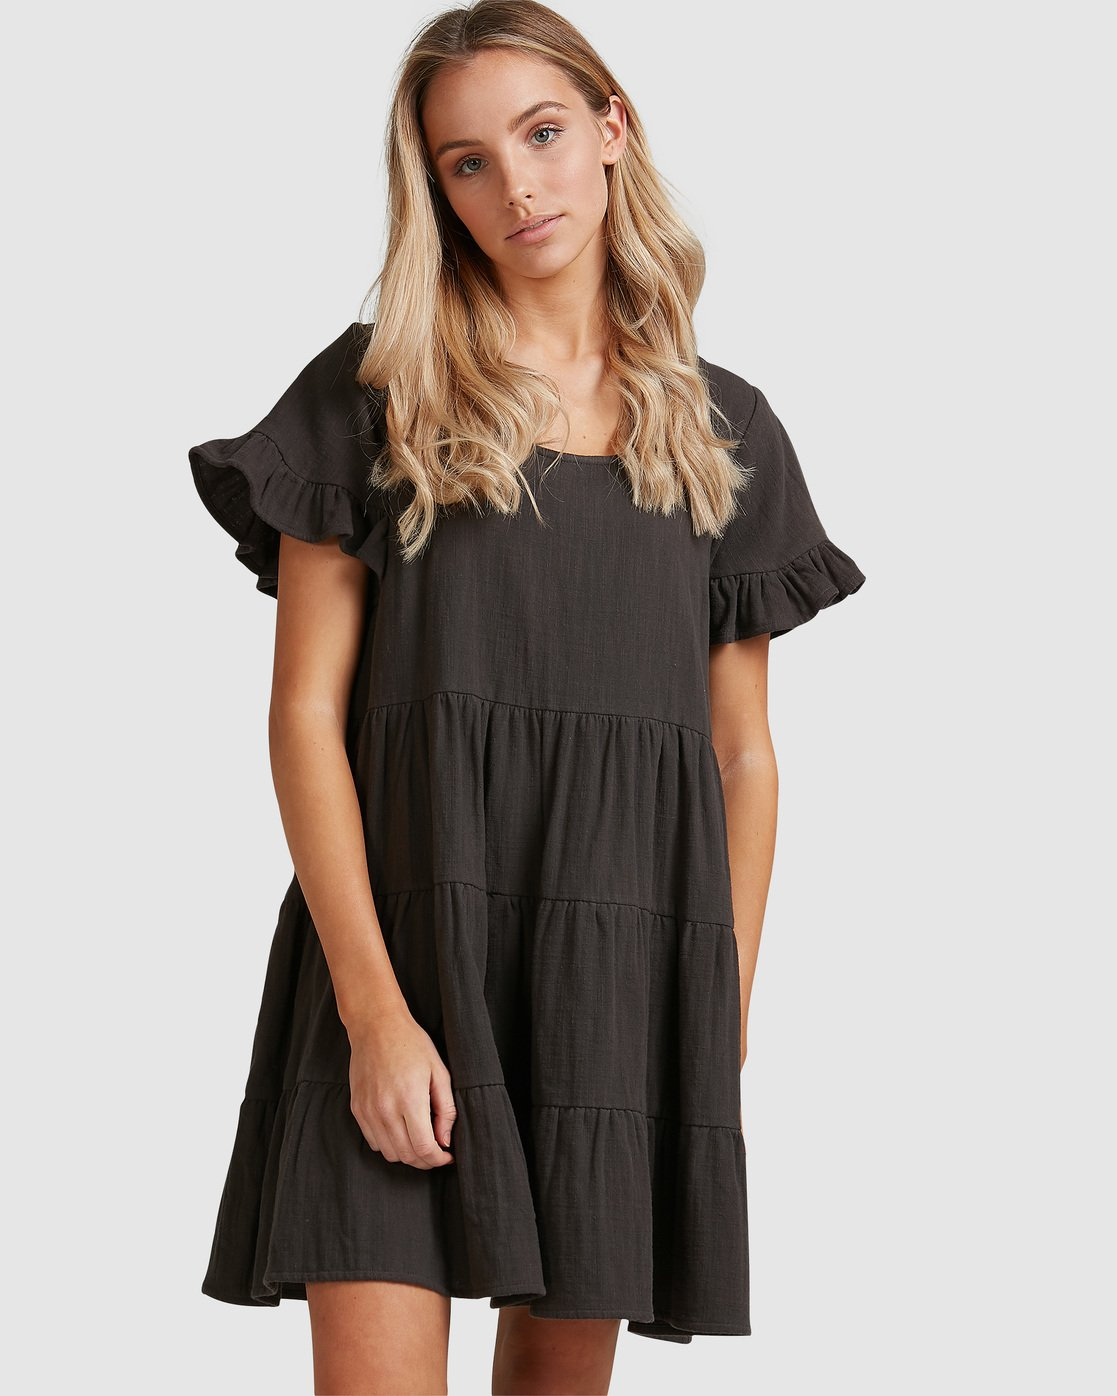 Woven Pixie Dress Slashed Pixie Dress Geometric Woven Dress